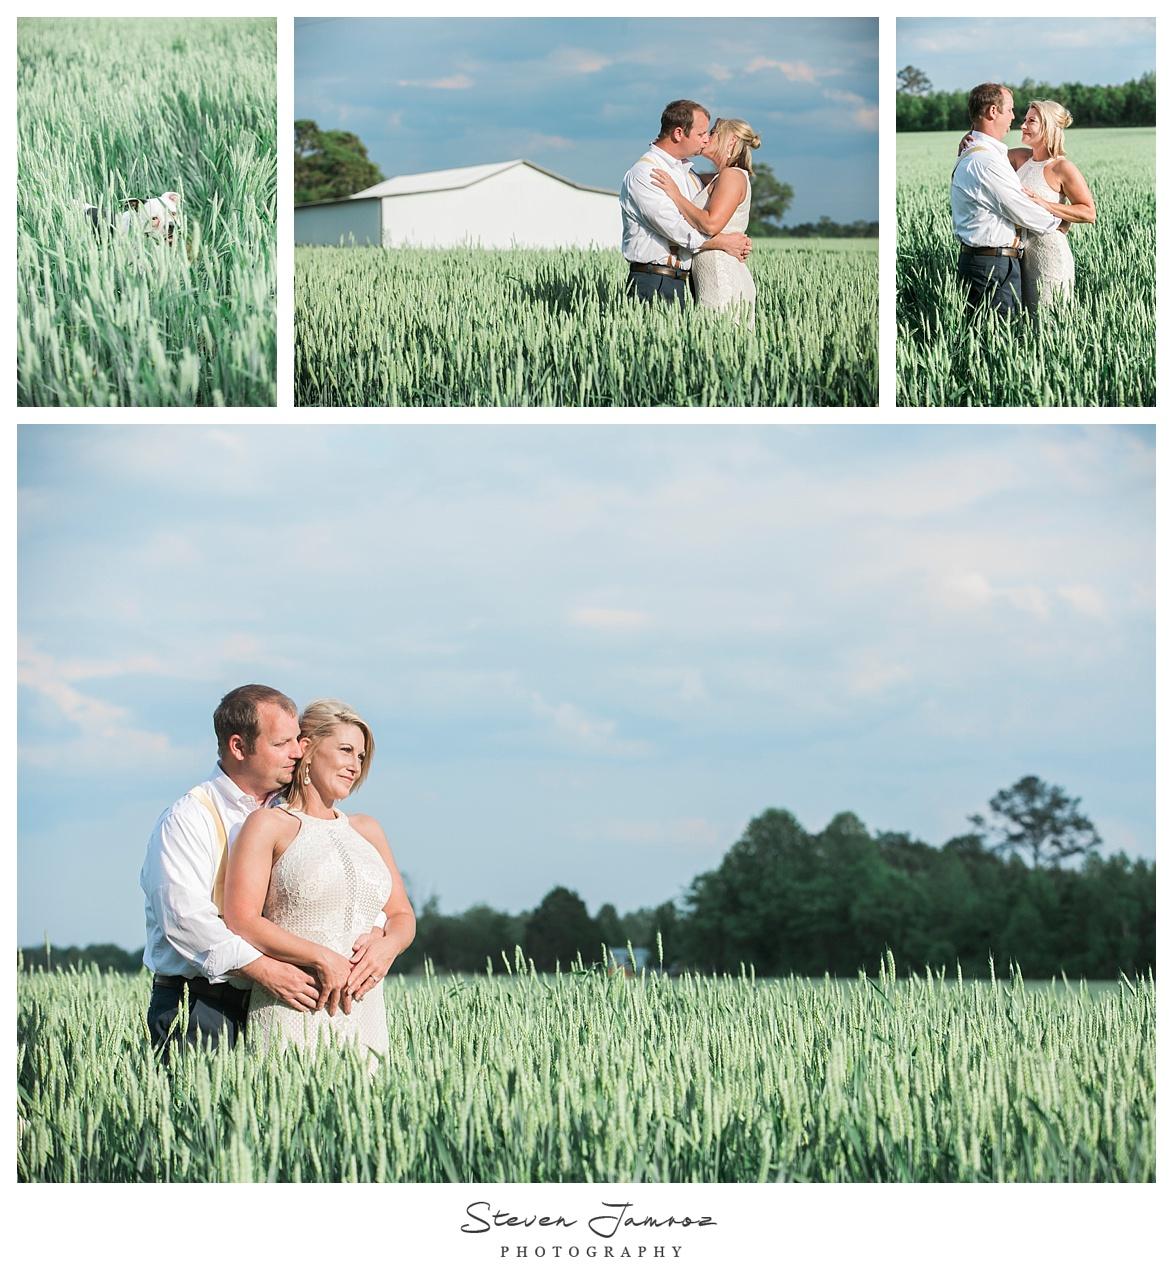 mount-olive-wedding-rustic-outdoor-steven-jamroz-photography-0977.jpg